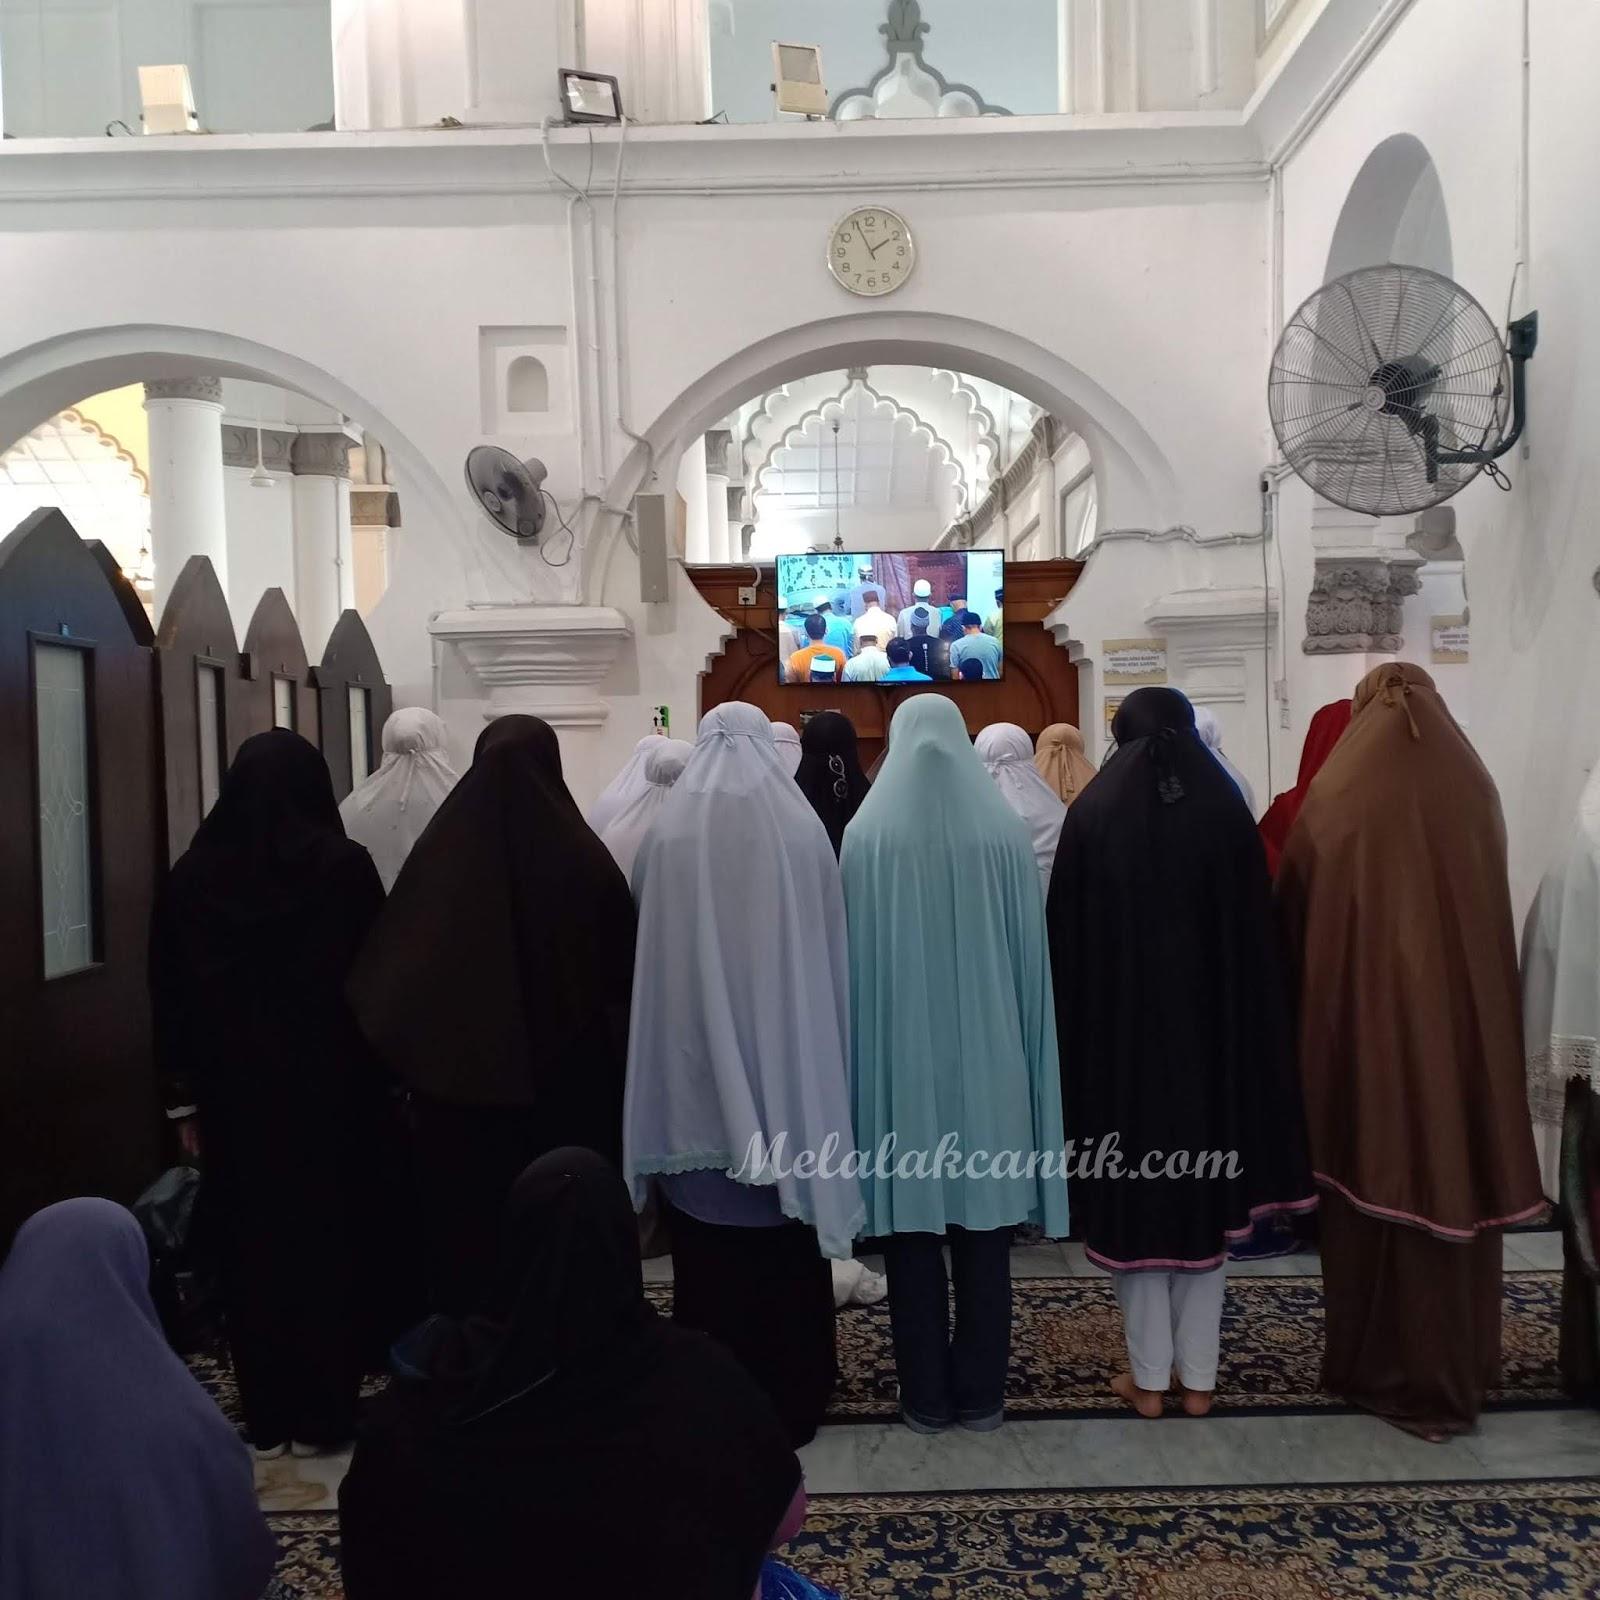 Masjid Kapitan Keling Penang, Malaysia